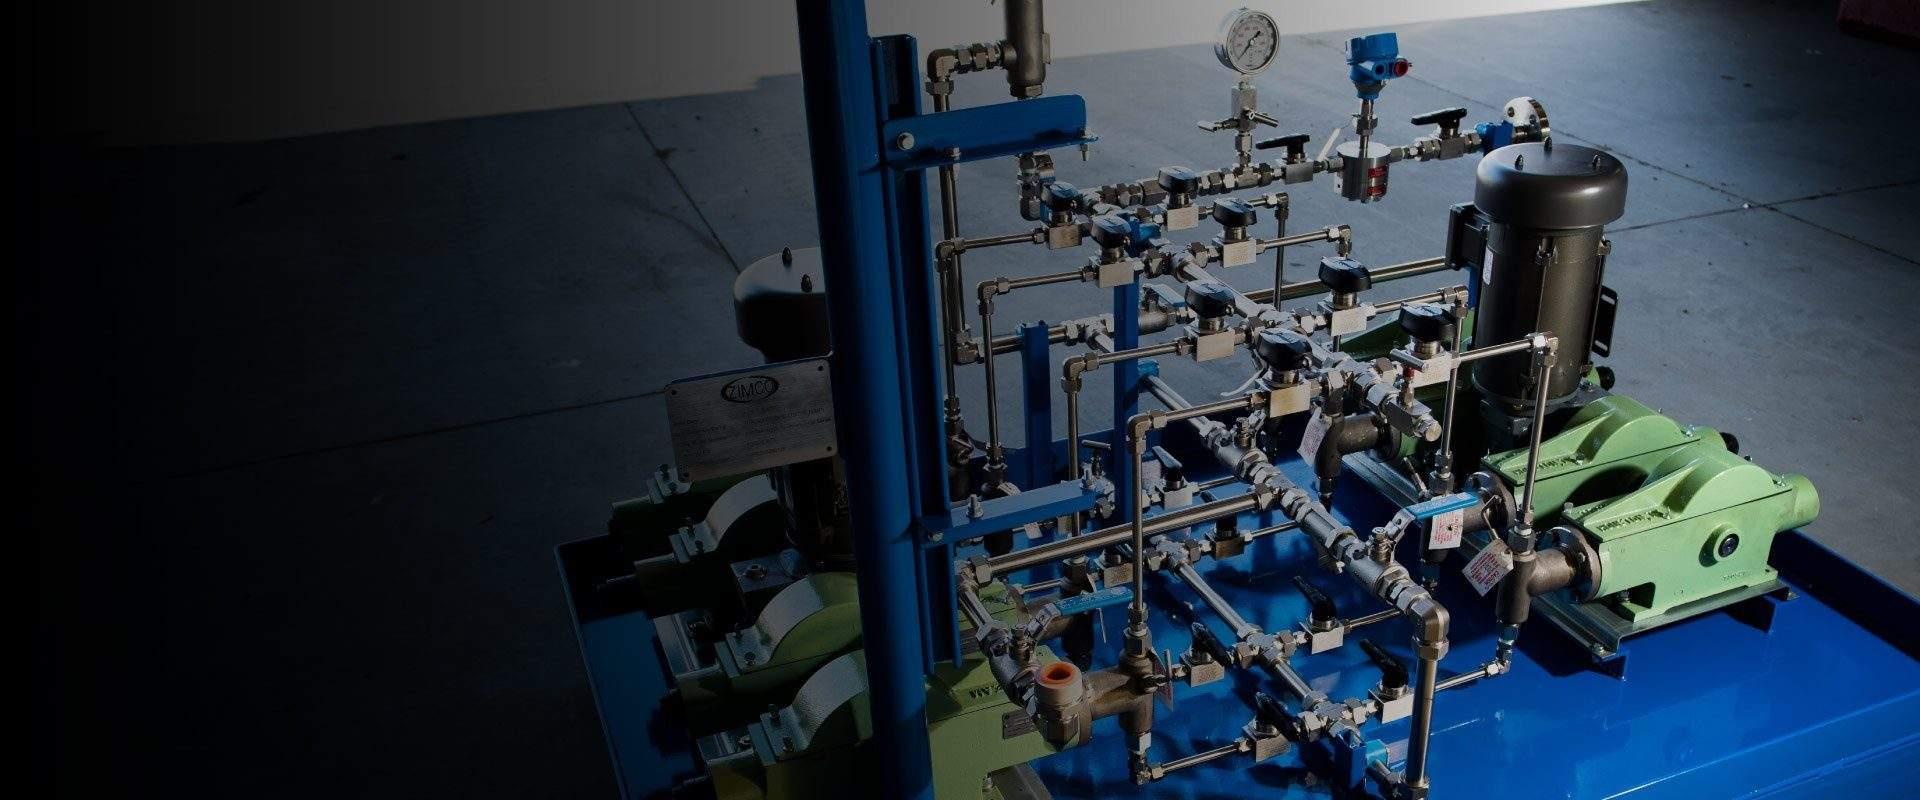 Reece Custom Process Equipment